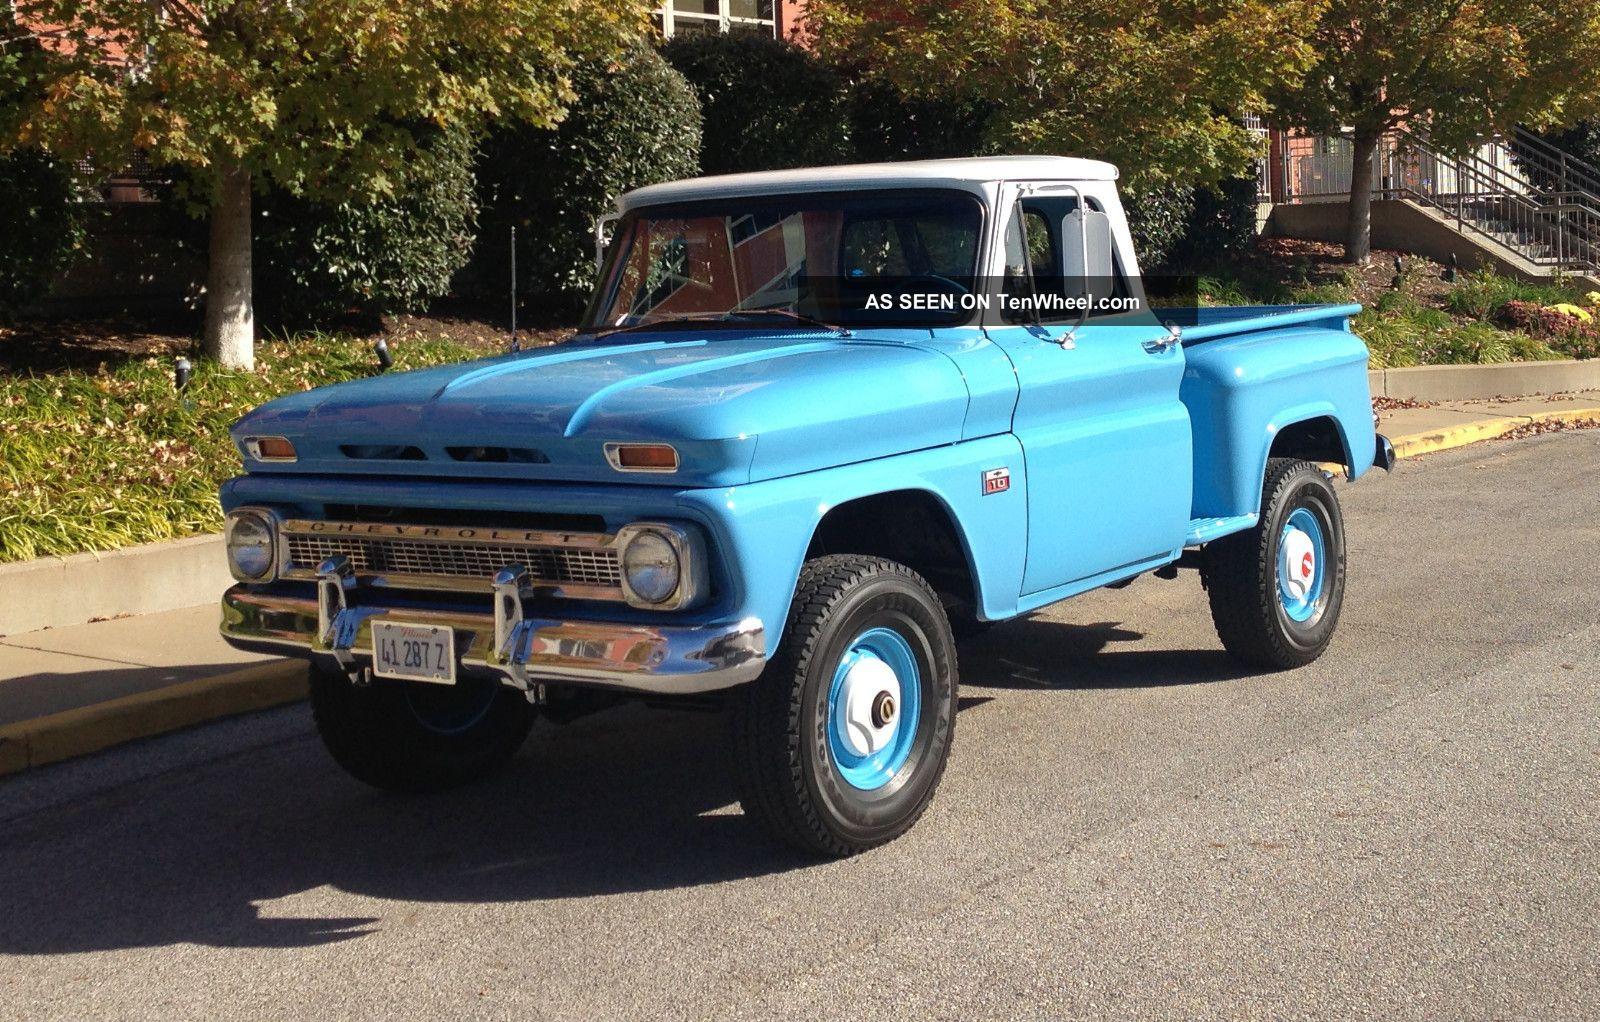 1966 chevrolet c10 factory 4x4 truck. Black Bedroom Furniture Sets. Home Design Ideas